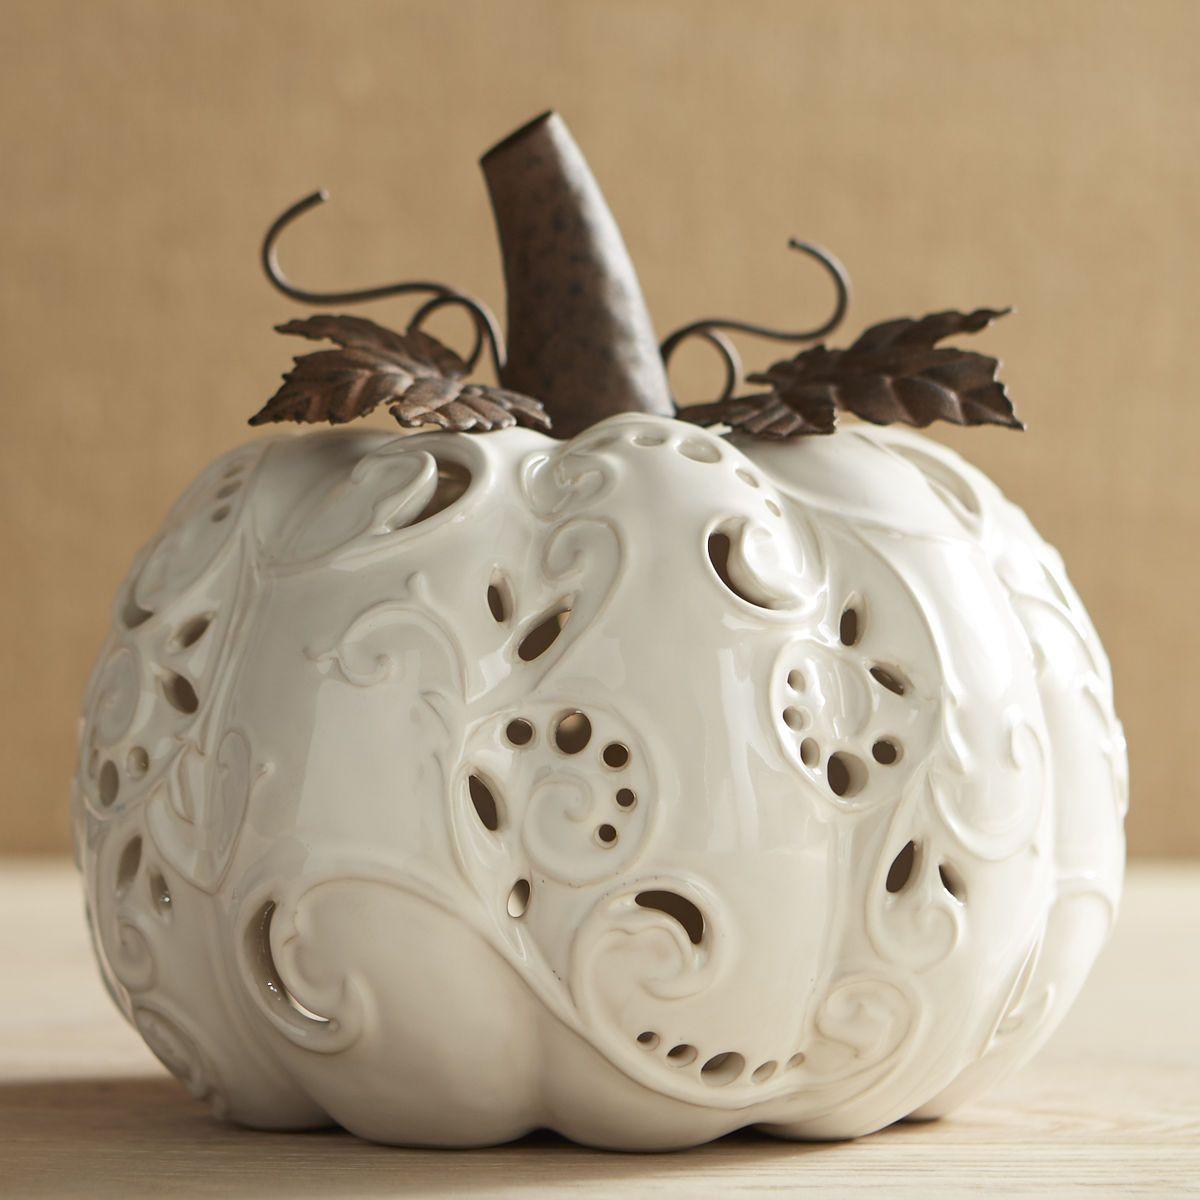 pier one owl vase of large ceramic ivory pumpkin tealight candle holder pier 1 imports pertaining to large ceramic ivory pumpkin tealight candle holder pier 1 imports